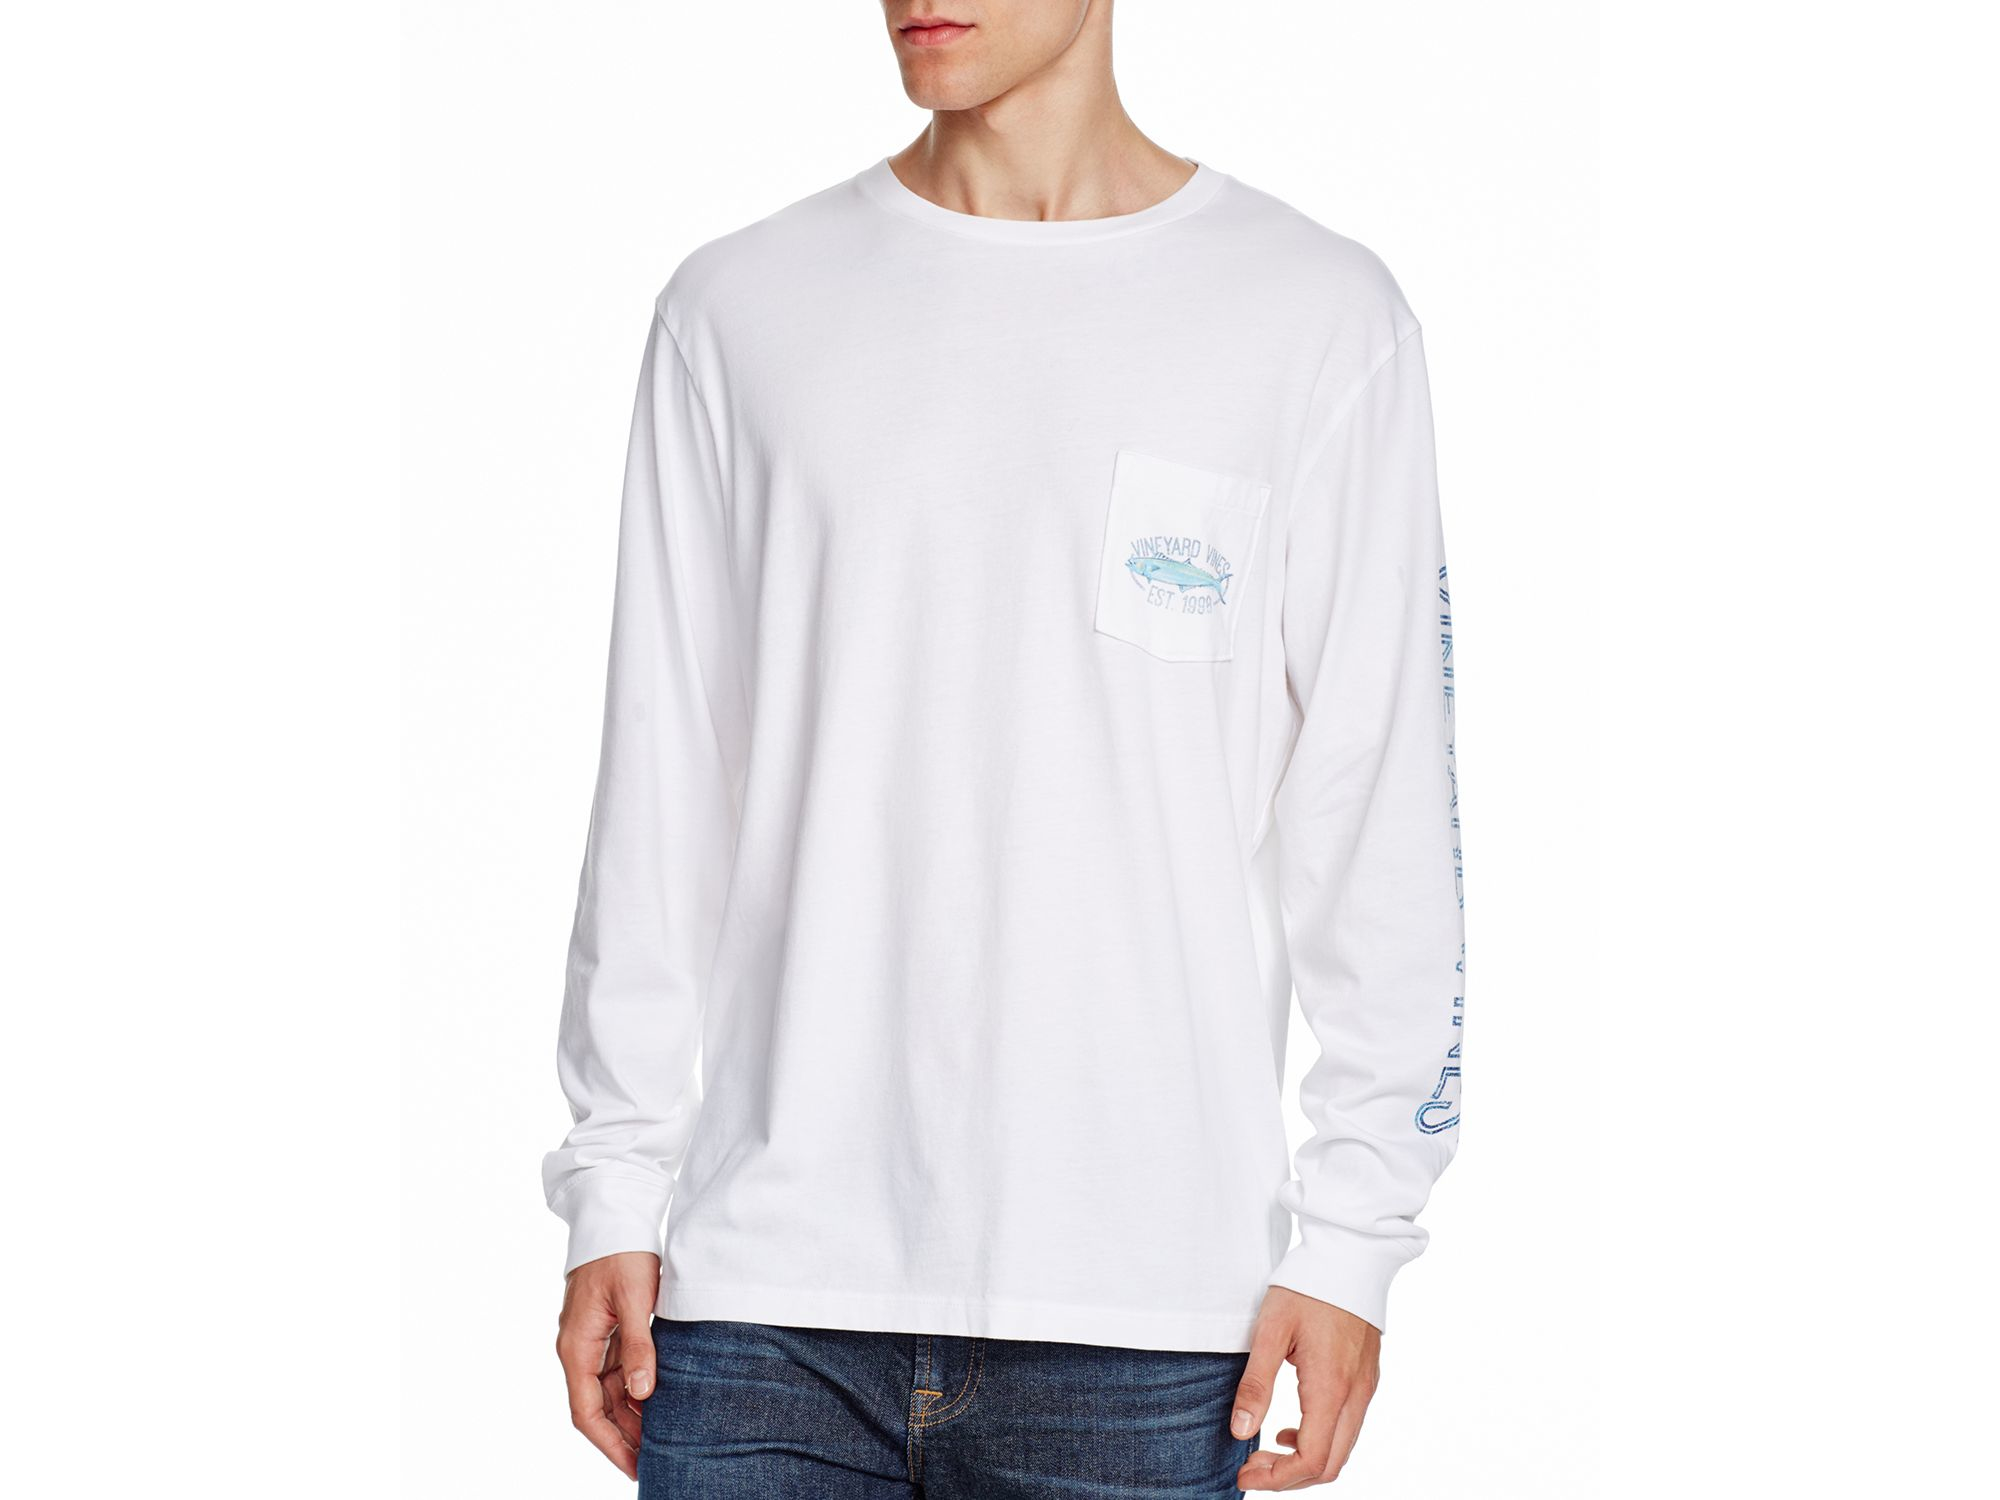 Vineyard vines clean catch pocket tee in white for men lyst for Vineyard vines fishing shirt